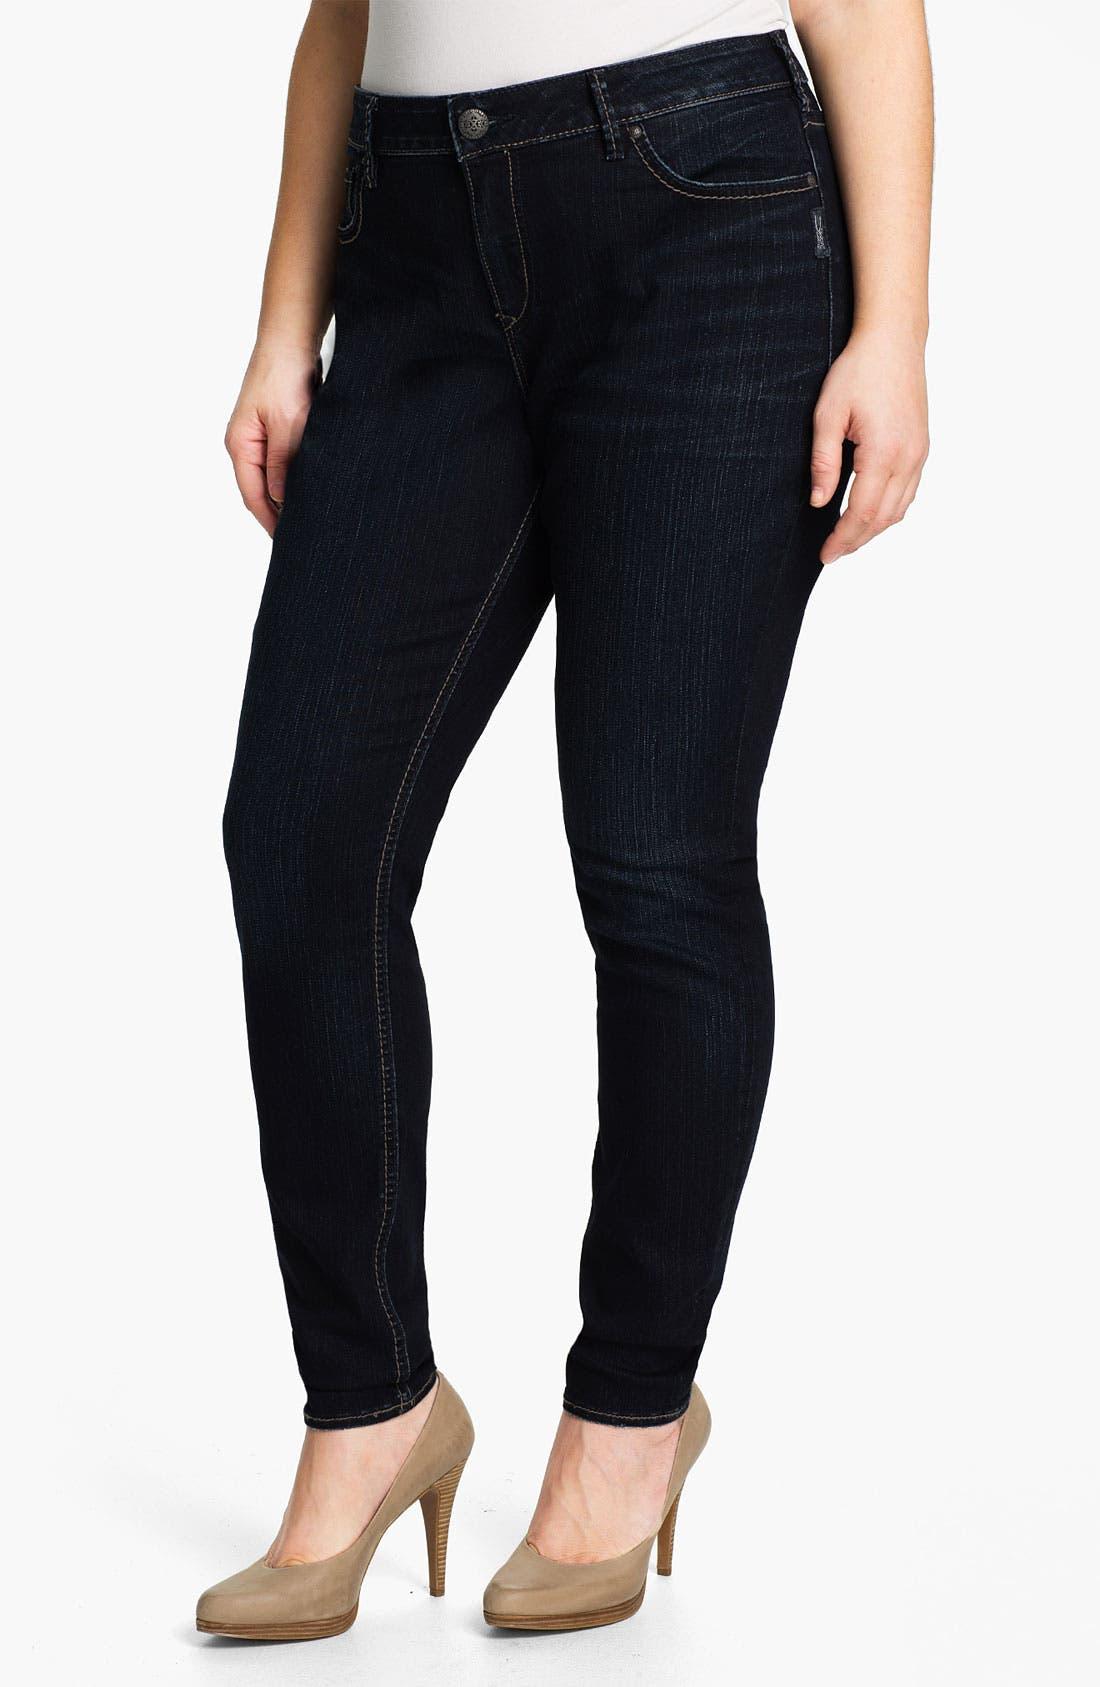 Main Image - Silver Jeans Co. 'Stevie' Denim Leggings (Plus)